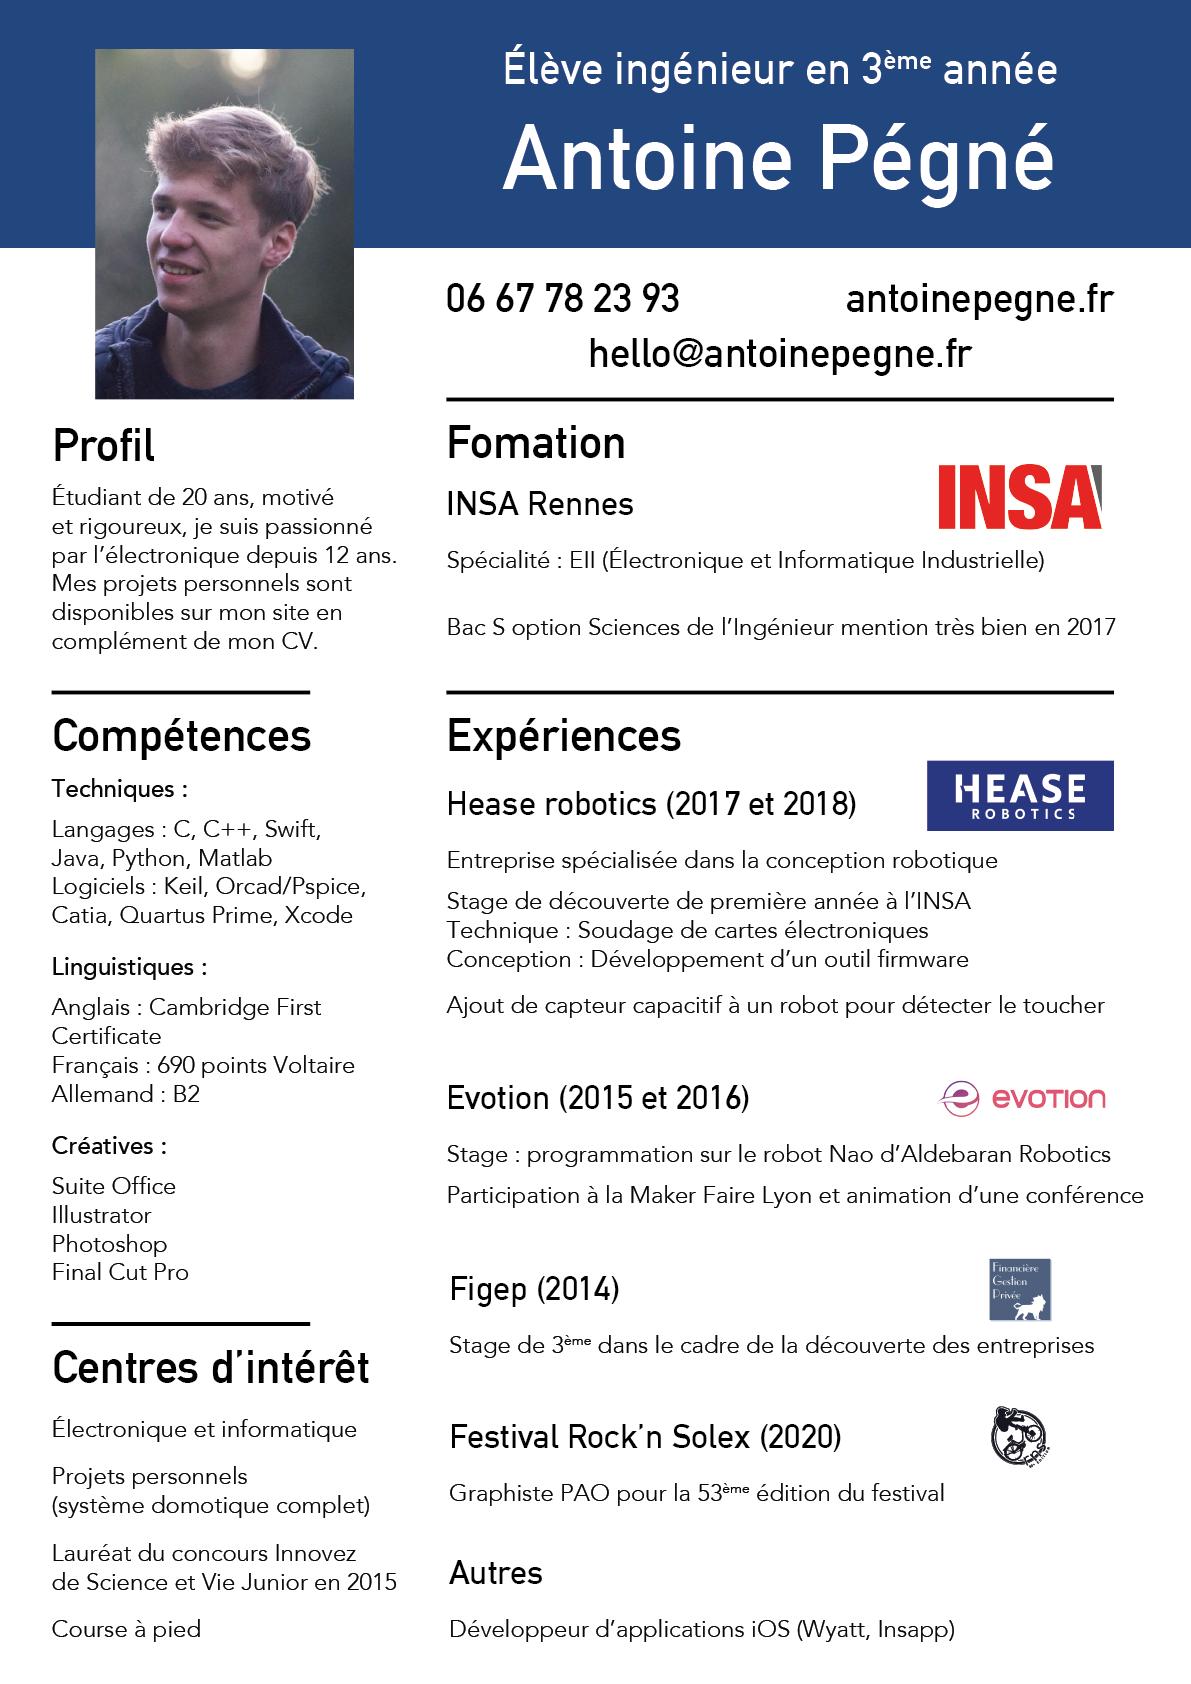 Antoine Pégné